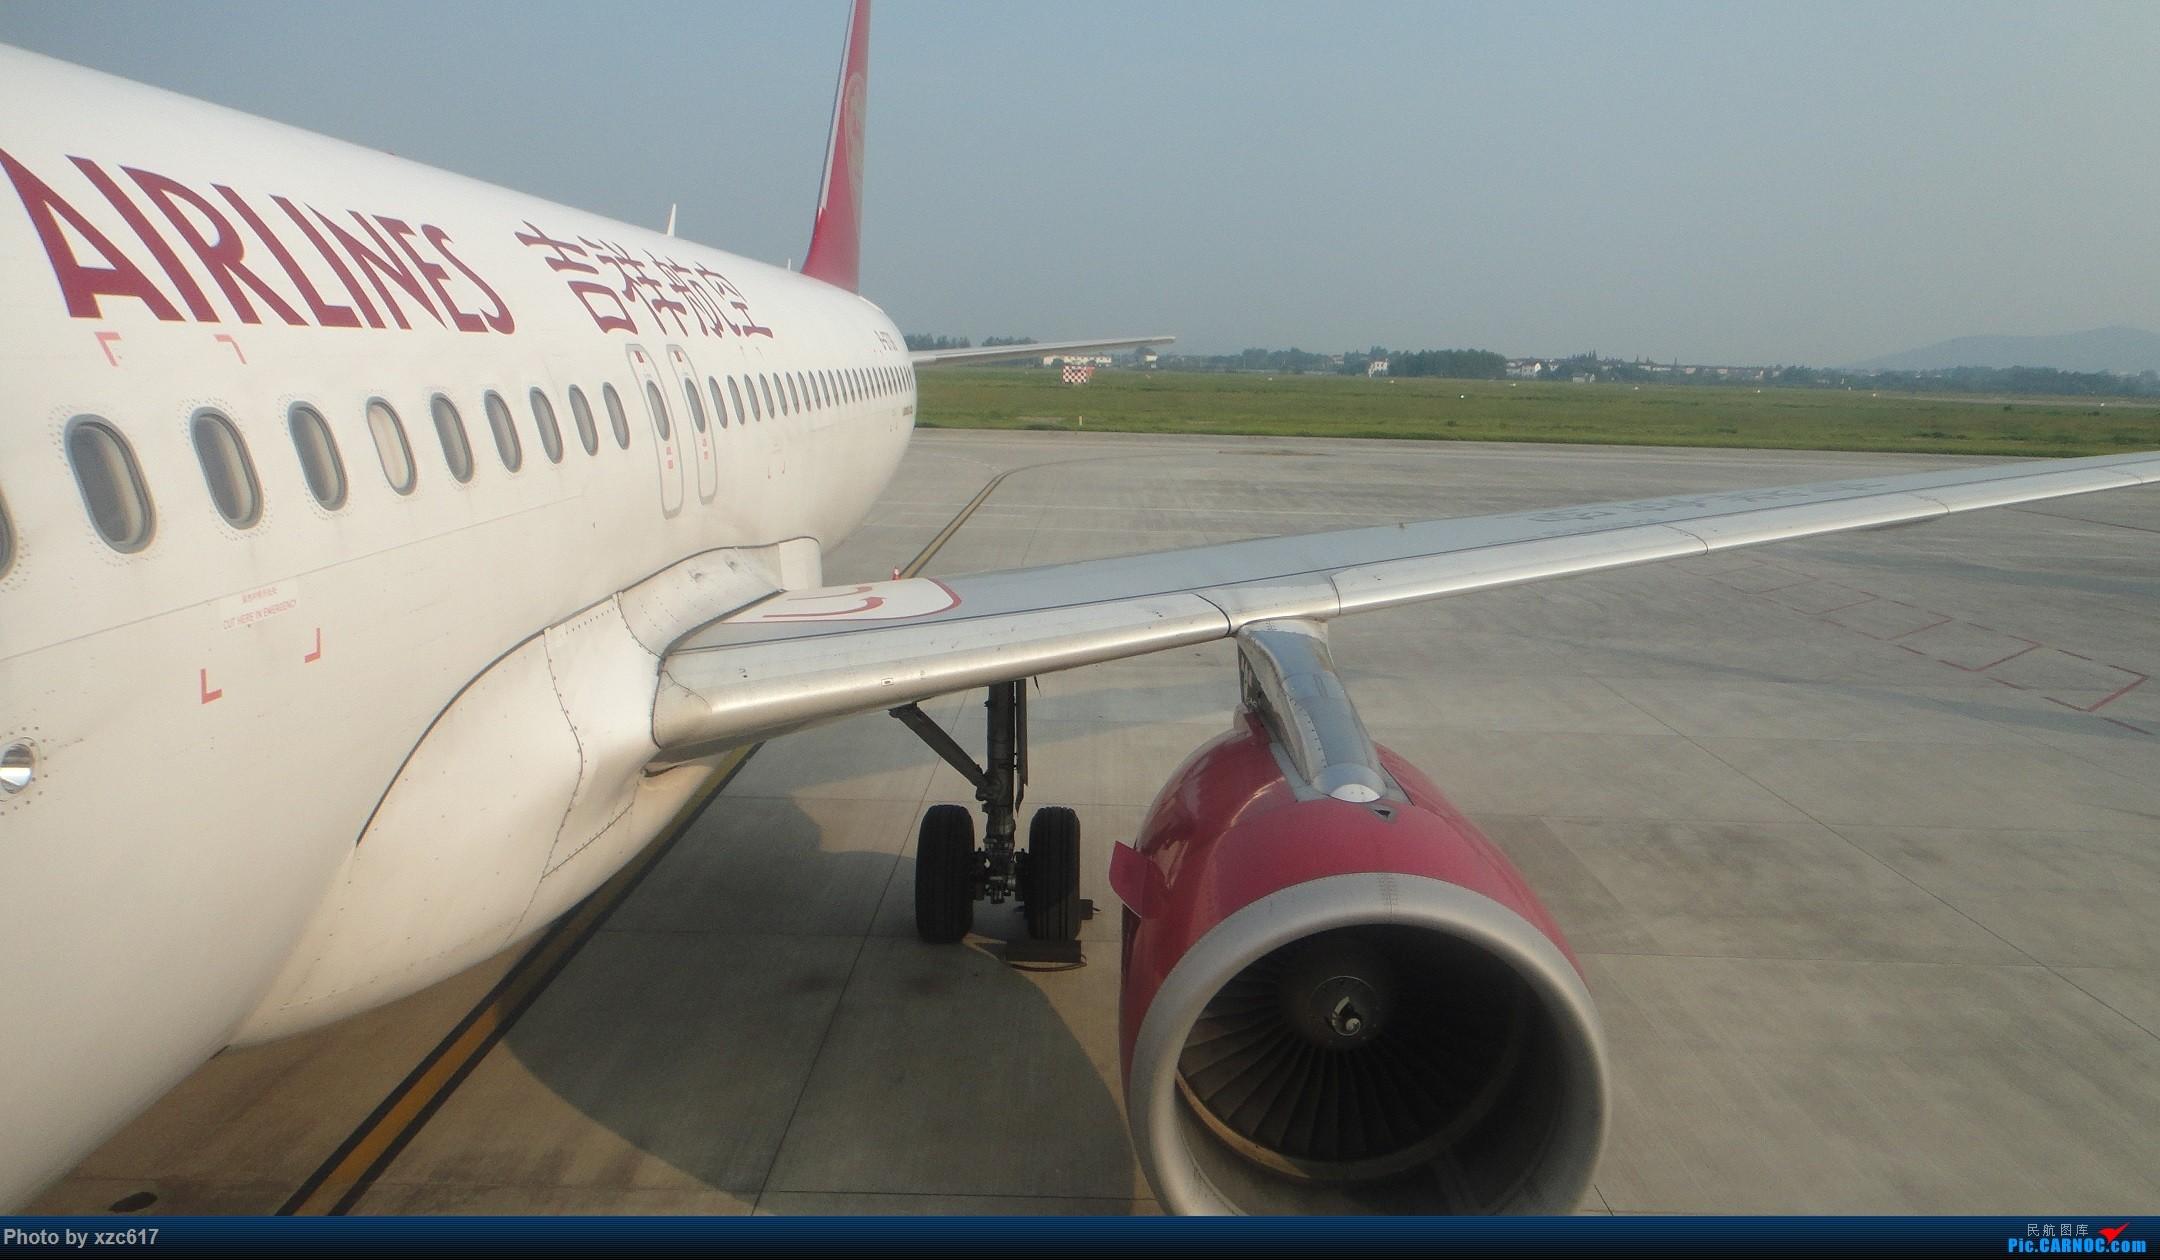 Re:[原创]xzc617的飞行游记 NO.1 由扬州到大连,平生第一次游海岛 AIRBUS A320-200 B-6736 中国南京禄口国际机场